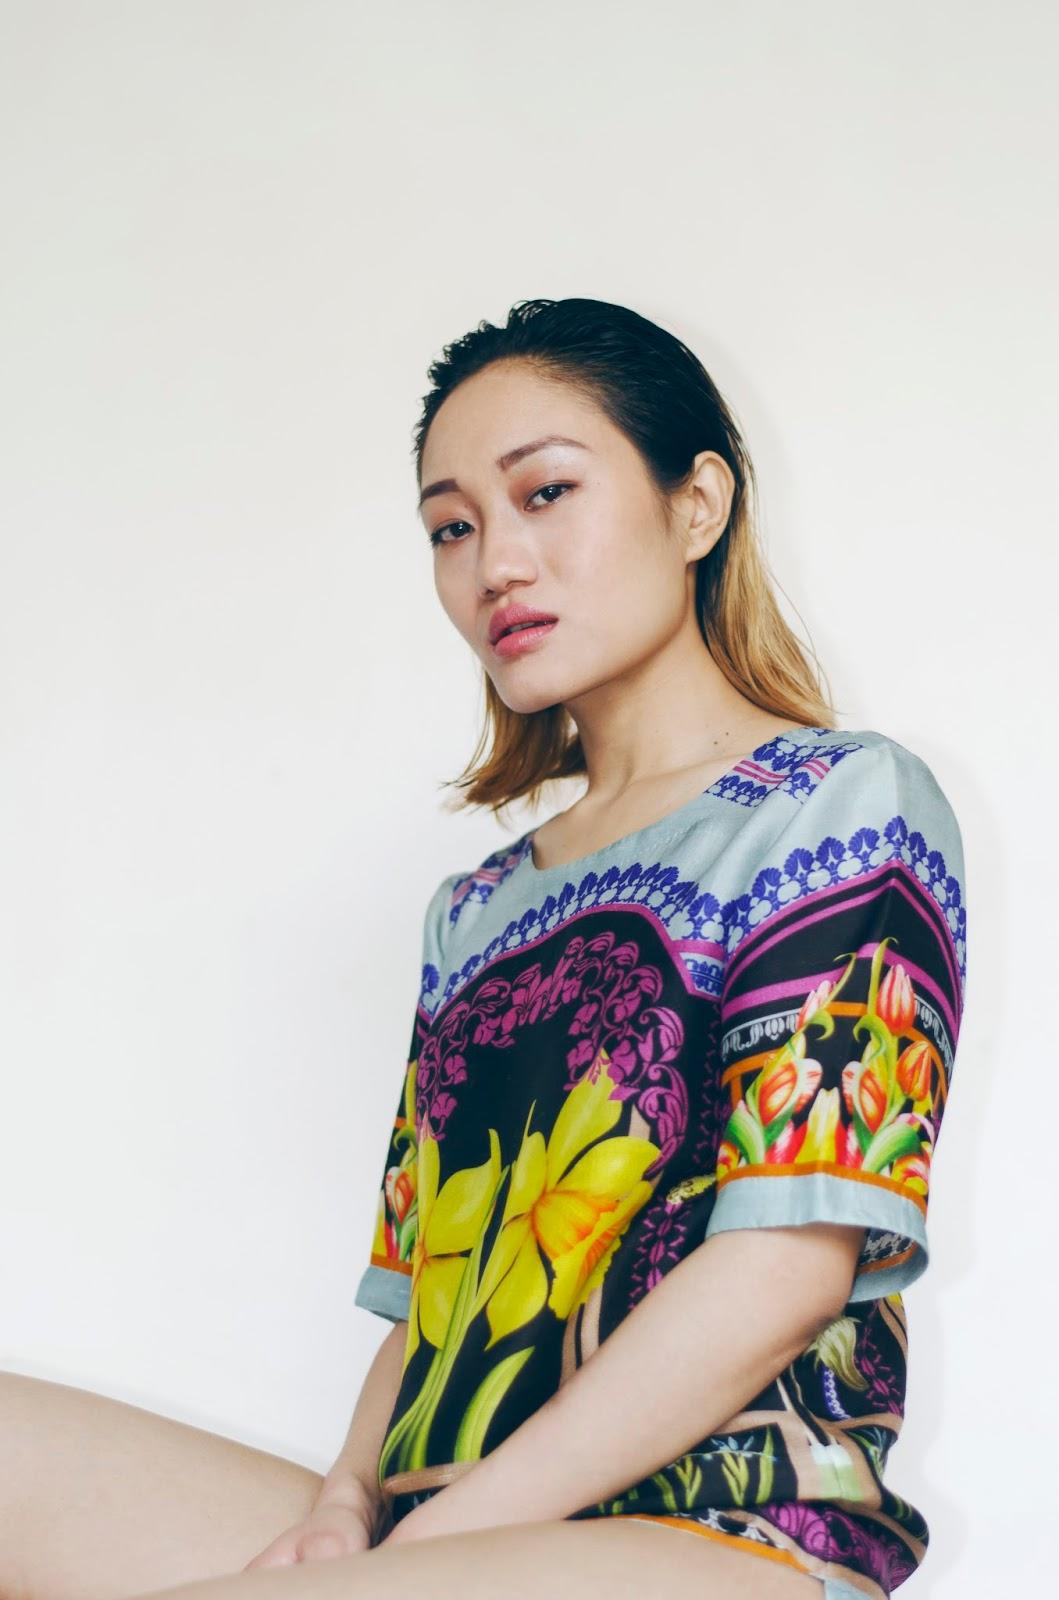 DIY photo-shoot at Home, Aien Jamir, Fashion & I, Indian Blogger, Fashion Blogger, New Delhi,